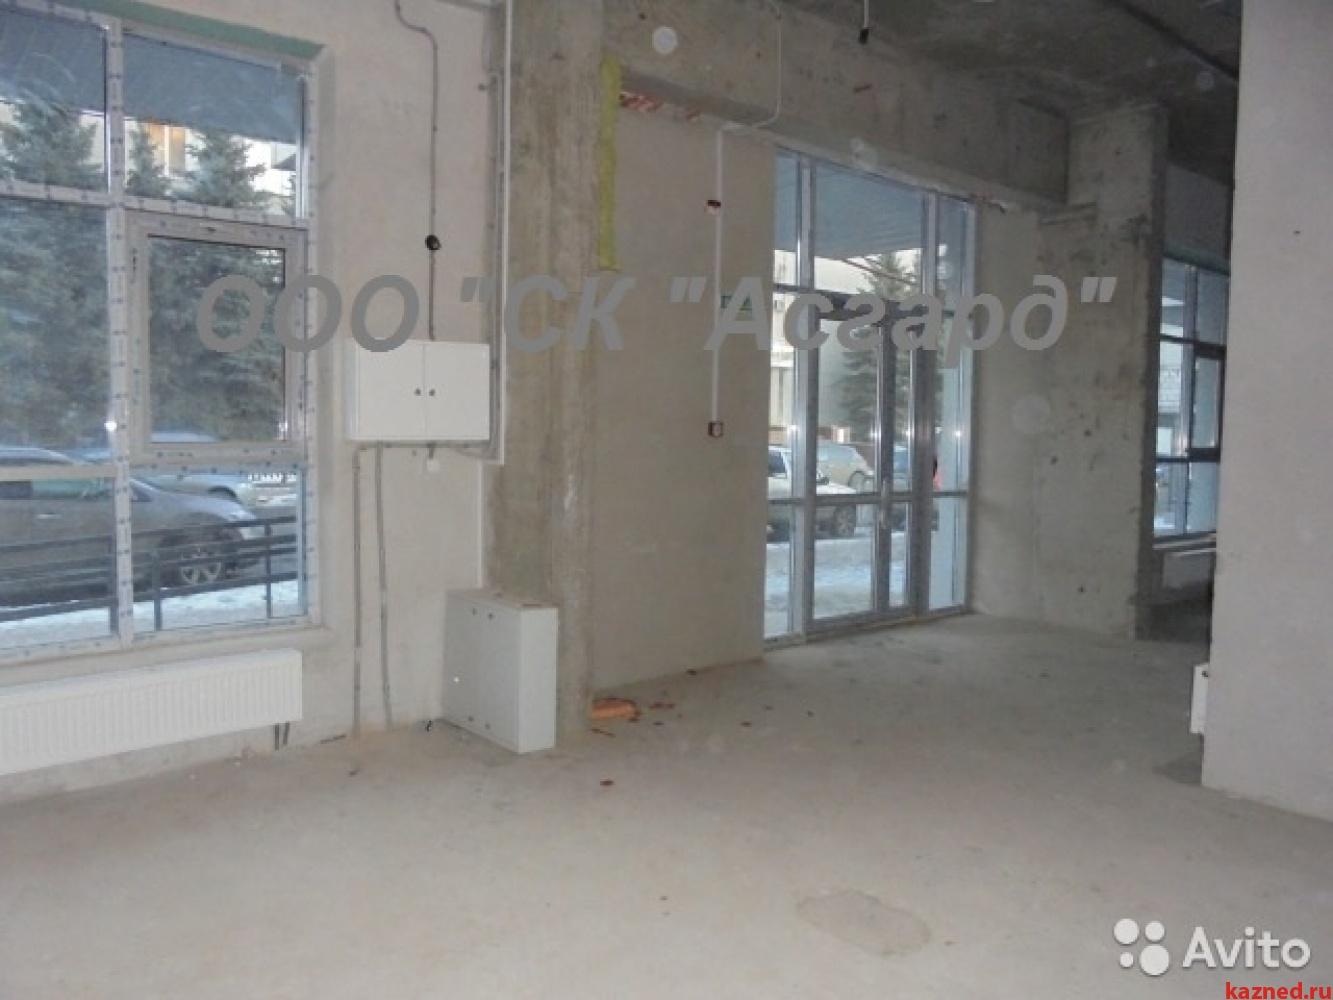 Продажа  офисно-торговые Шуртыгина д.8, 94 м²  (миниатюра №3)